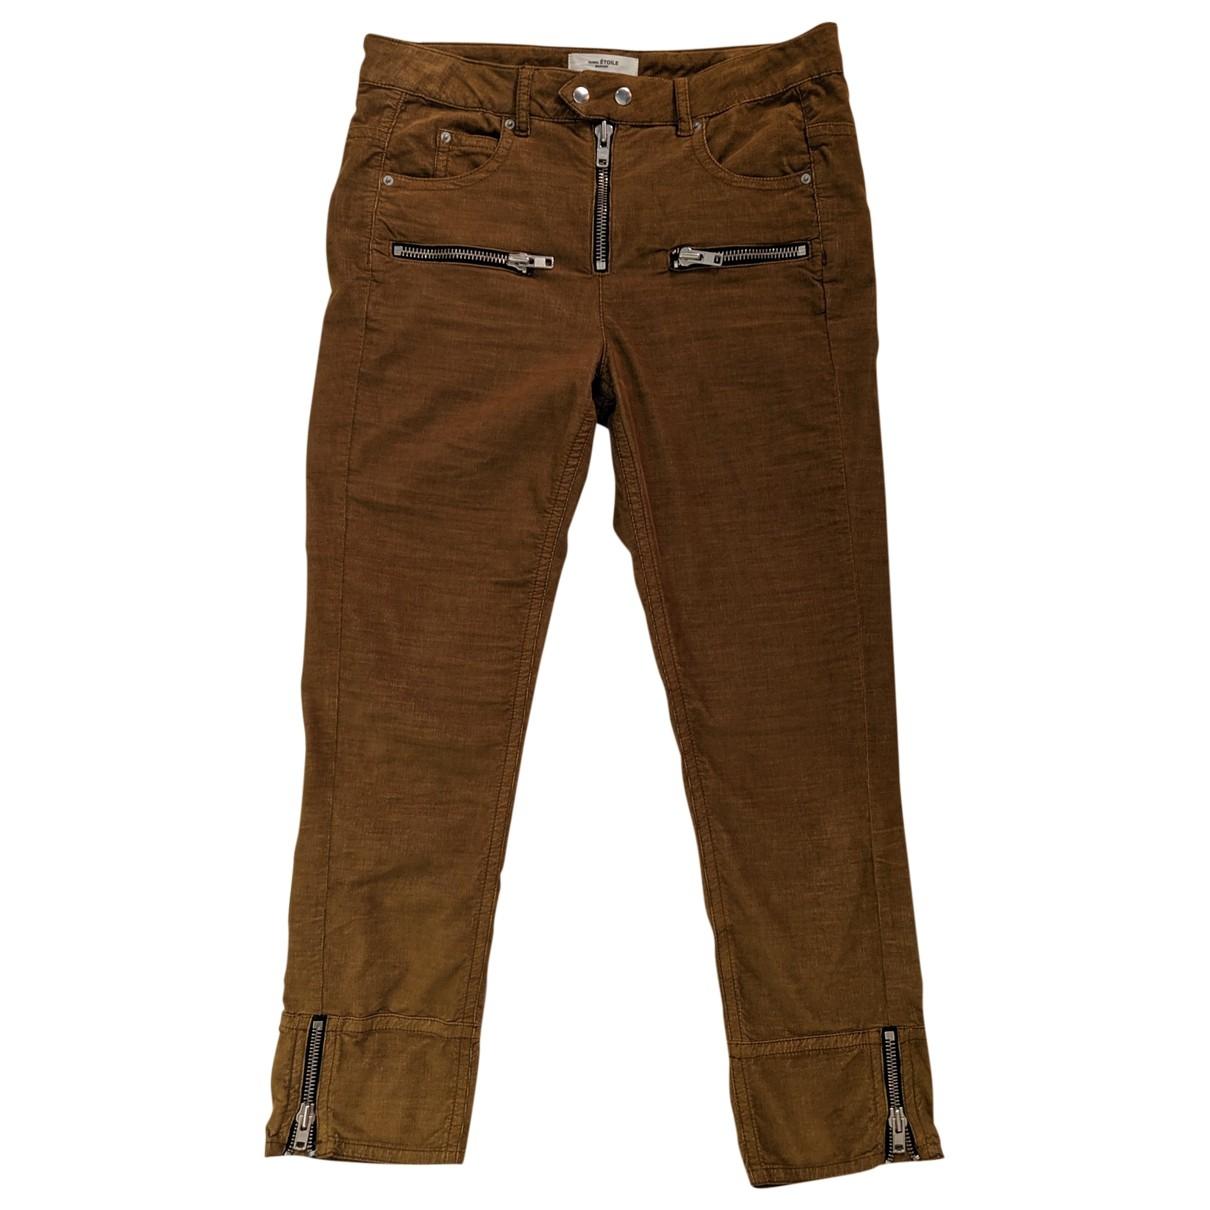 Isabel Marant Etoile \N Camel Cotton Trousers for Women 40 FR